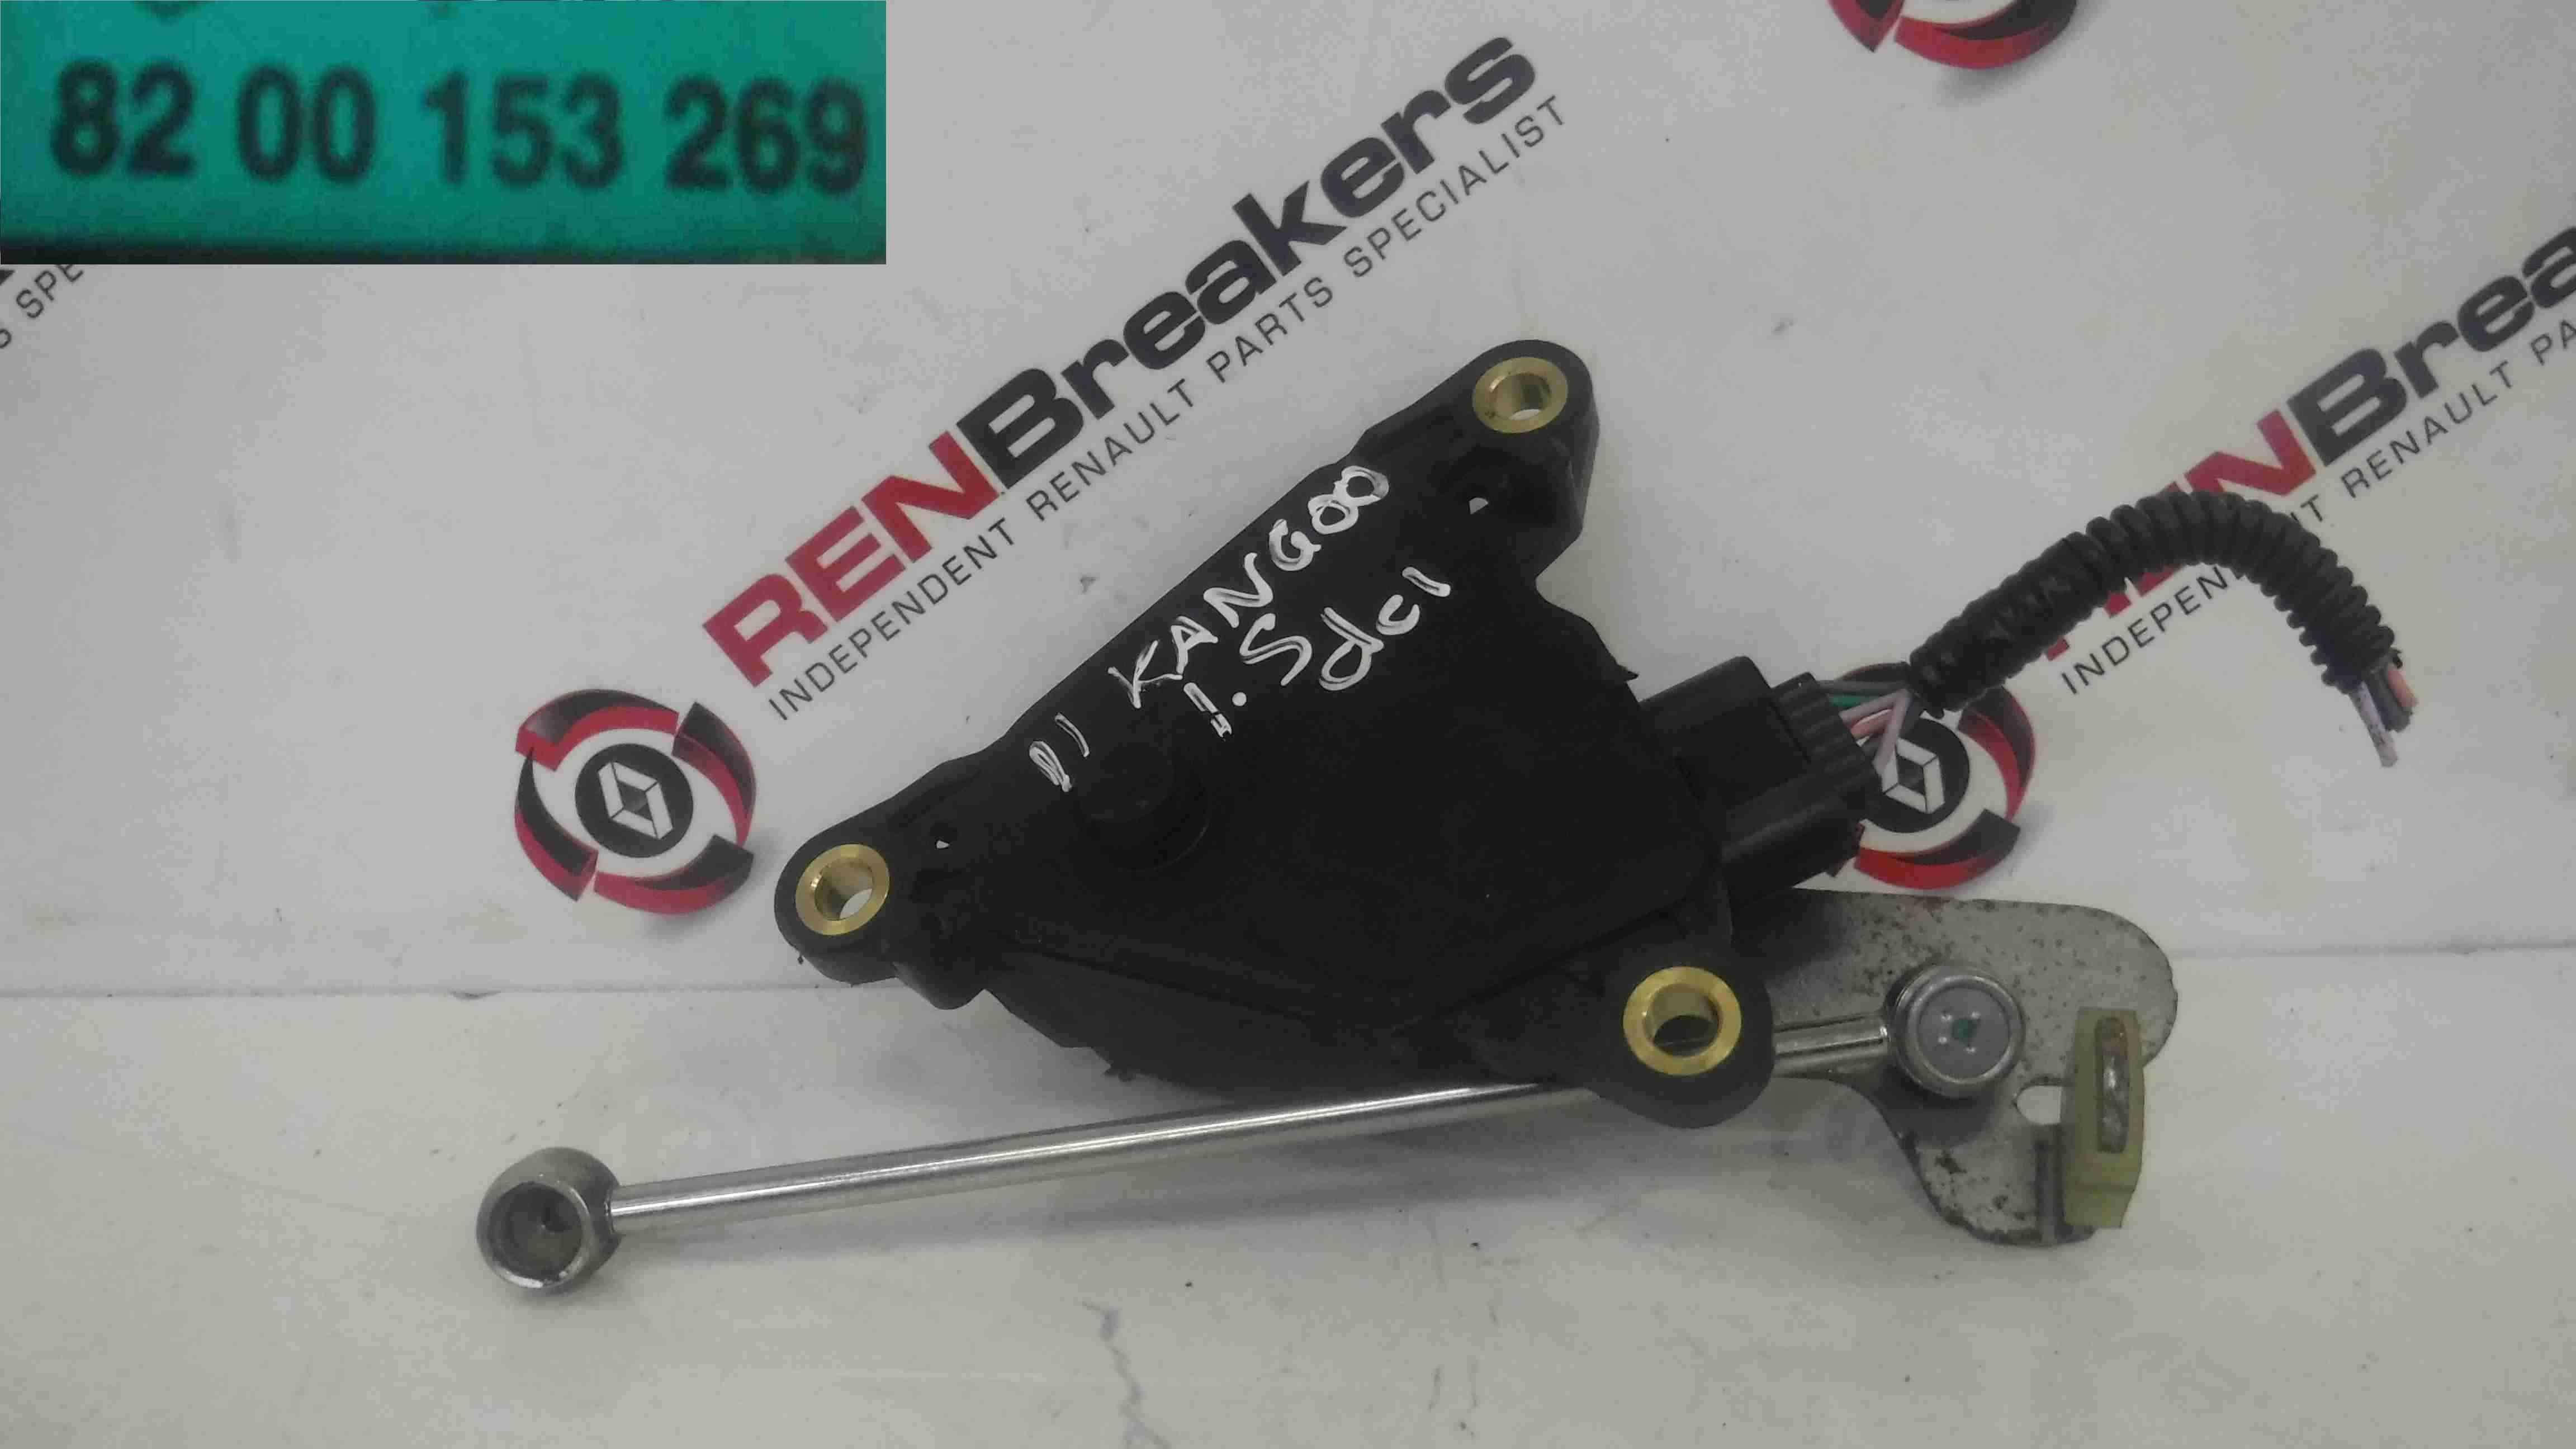 Renault Kangoo 2007-2017 Accelerator Throttle Pedal Potentiometer 8200153269